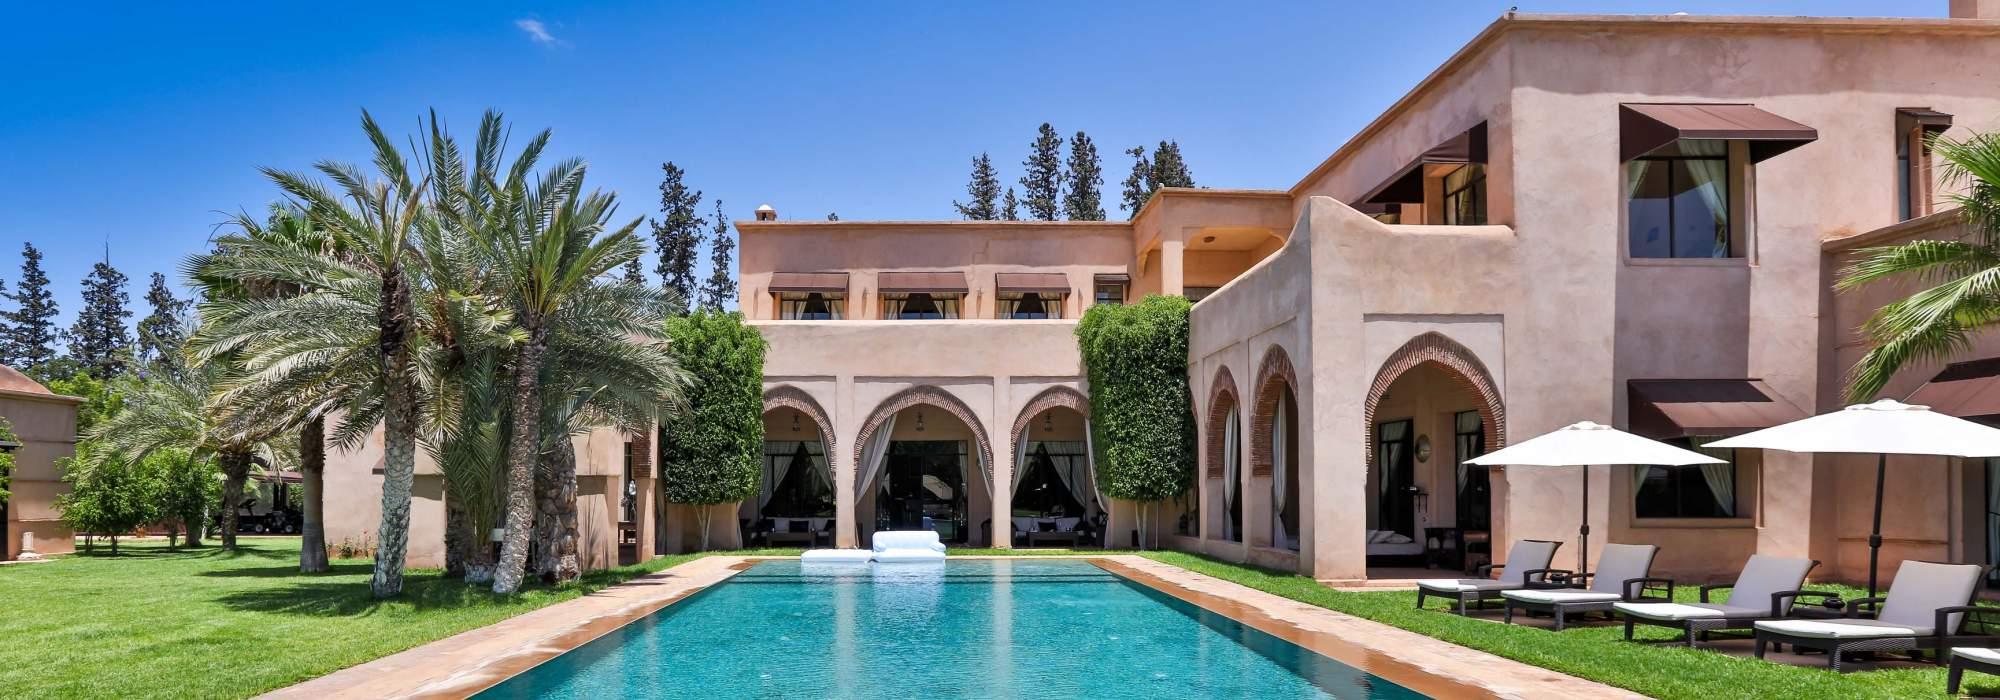 villa marocaine a vendre plameraie marrakech